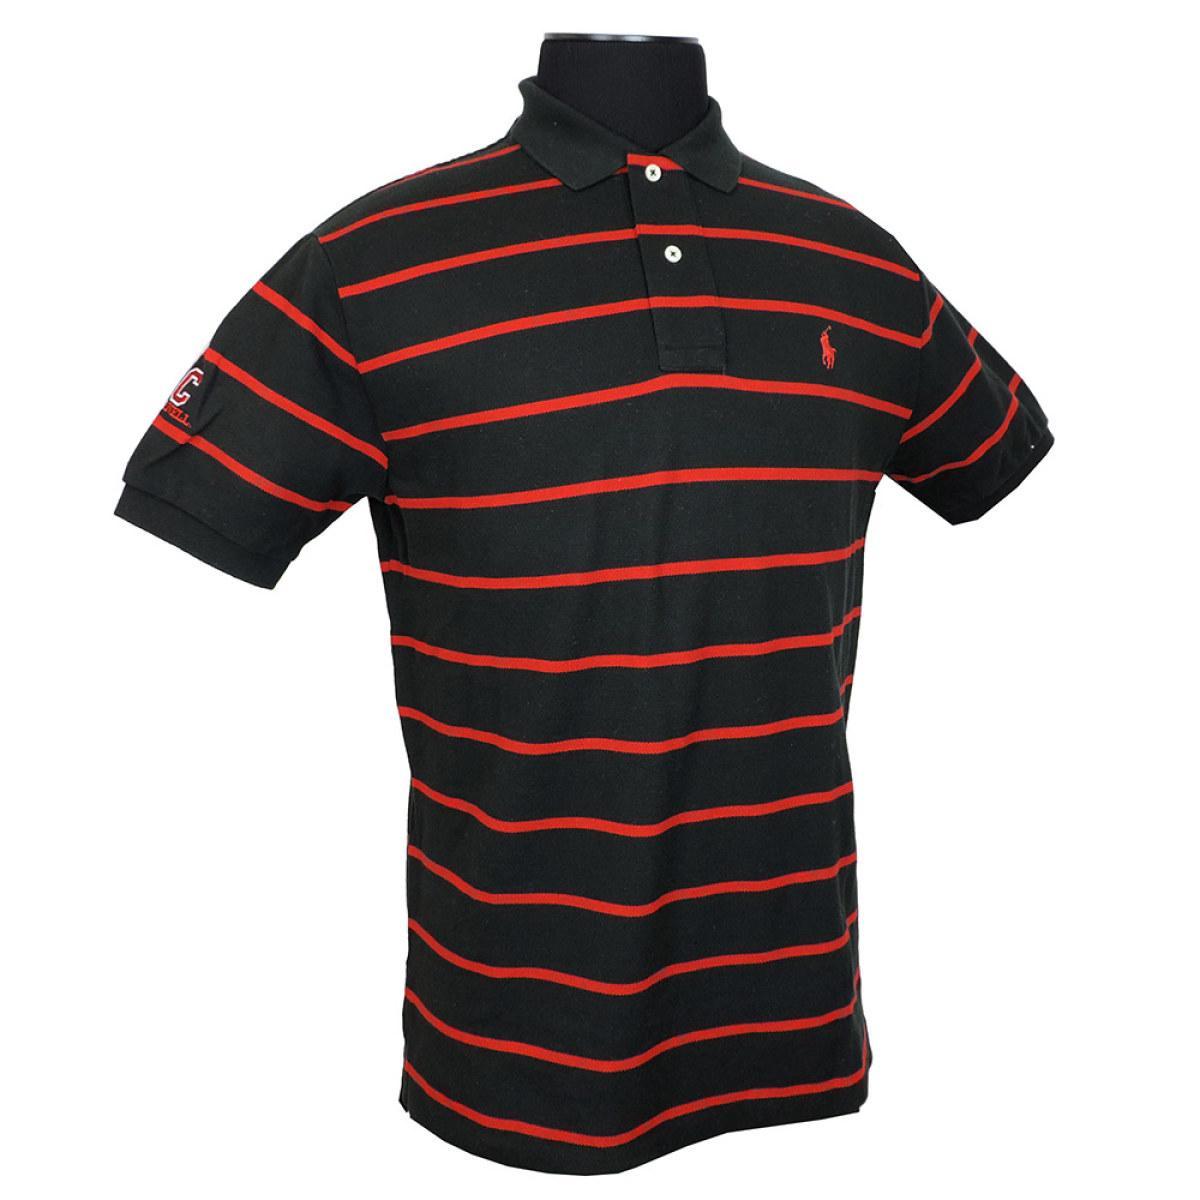 Ralph Lauren - Mesh Polo Shirt - Black W  Red Stripe dc533cc0d0d0